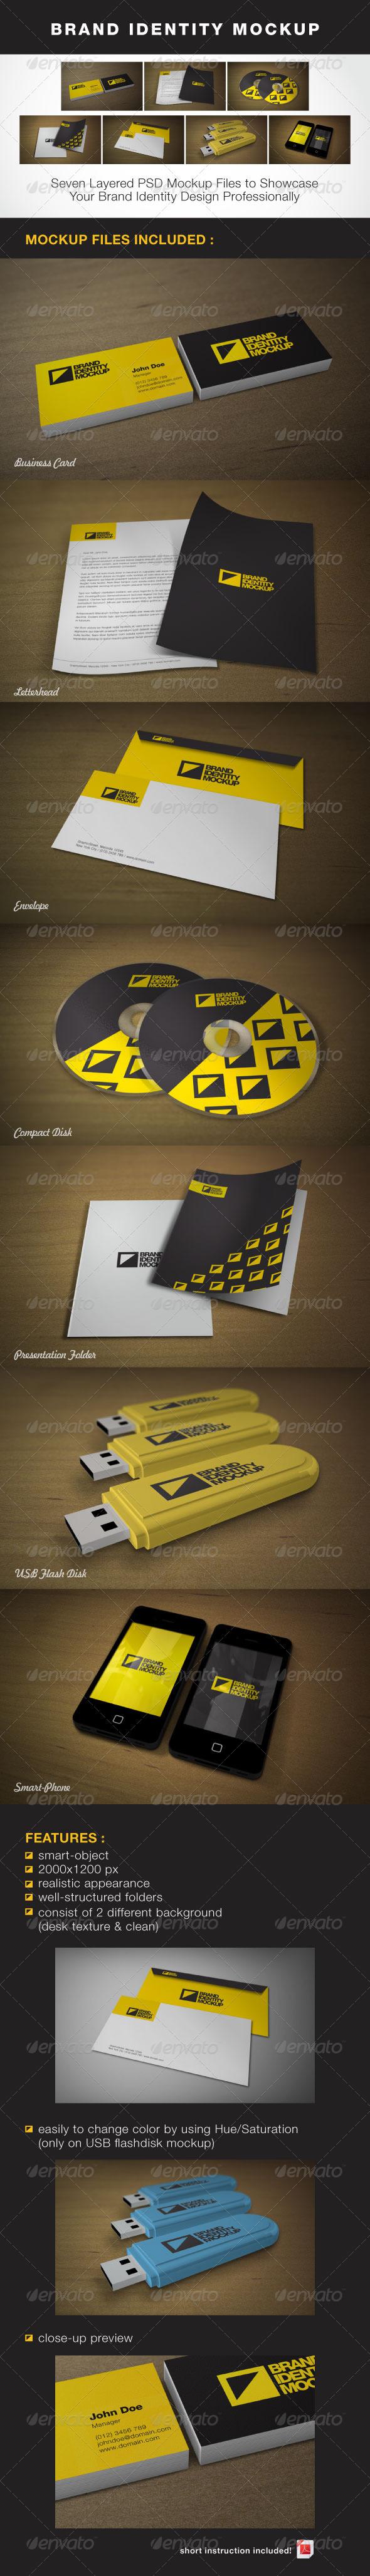 GraphicRiver Brand Identity Mock-up 1791344